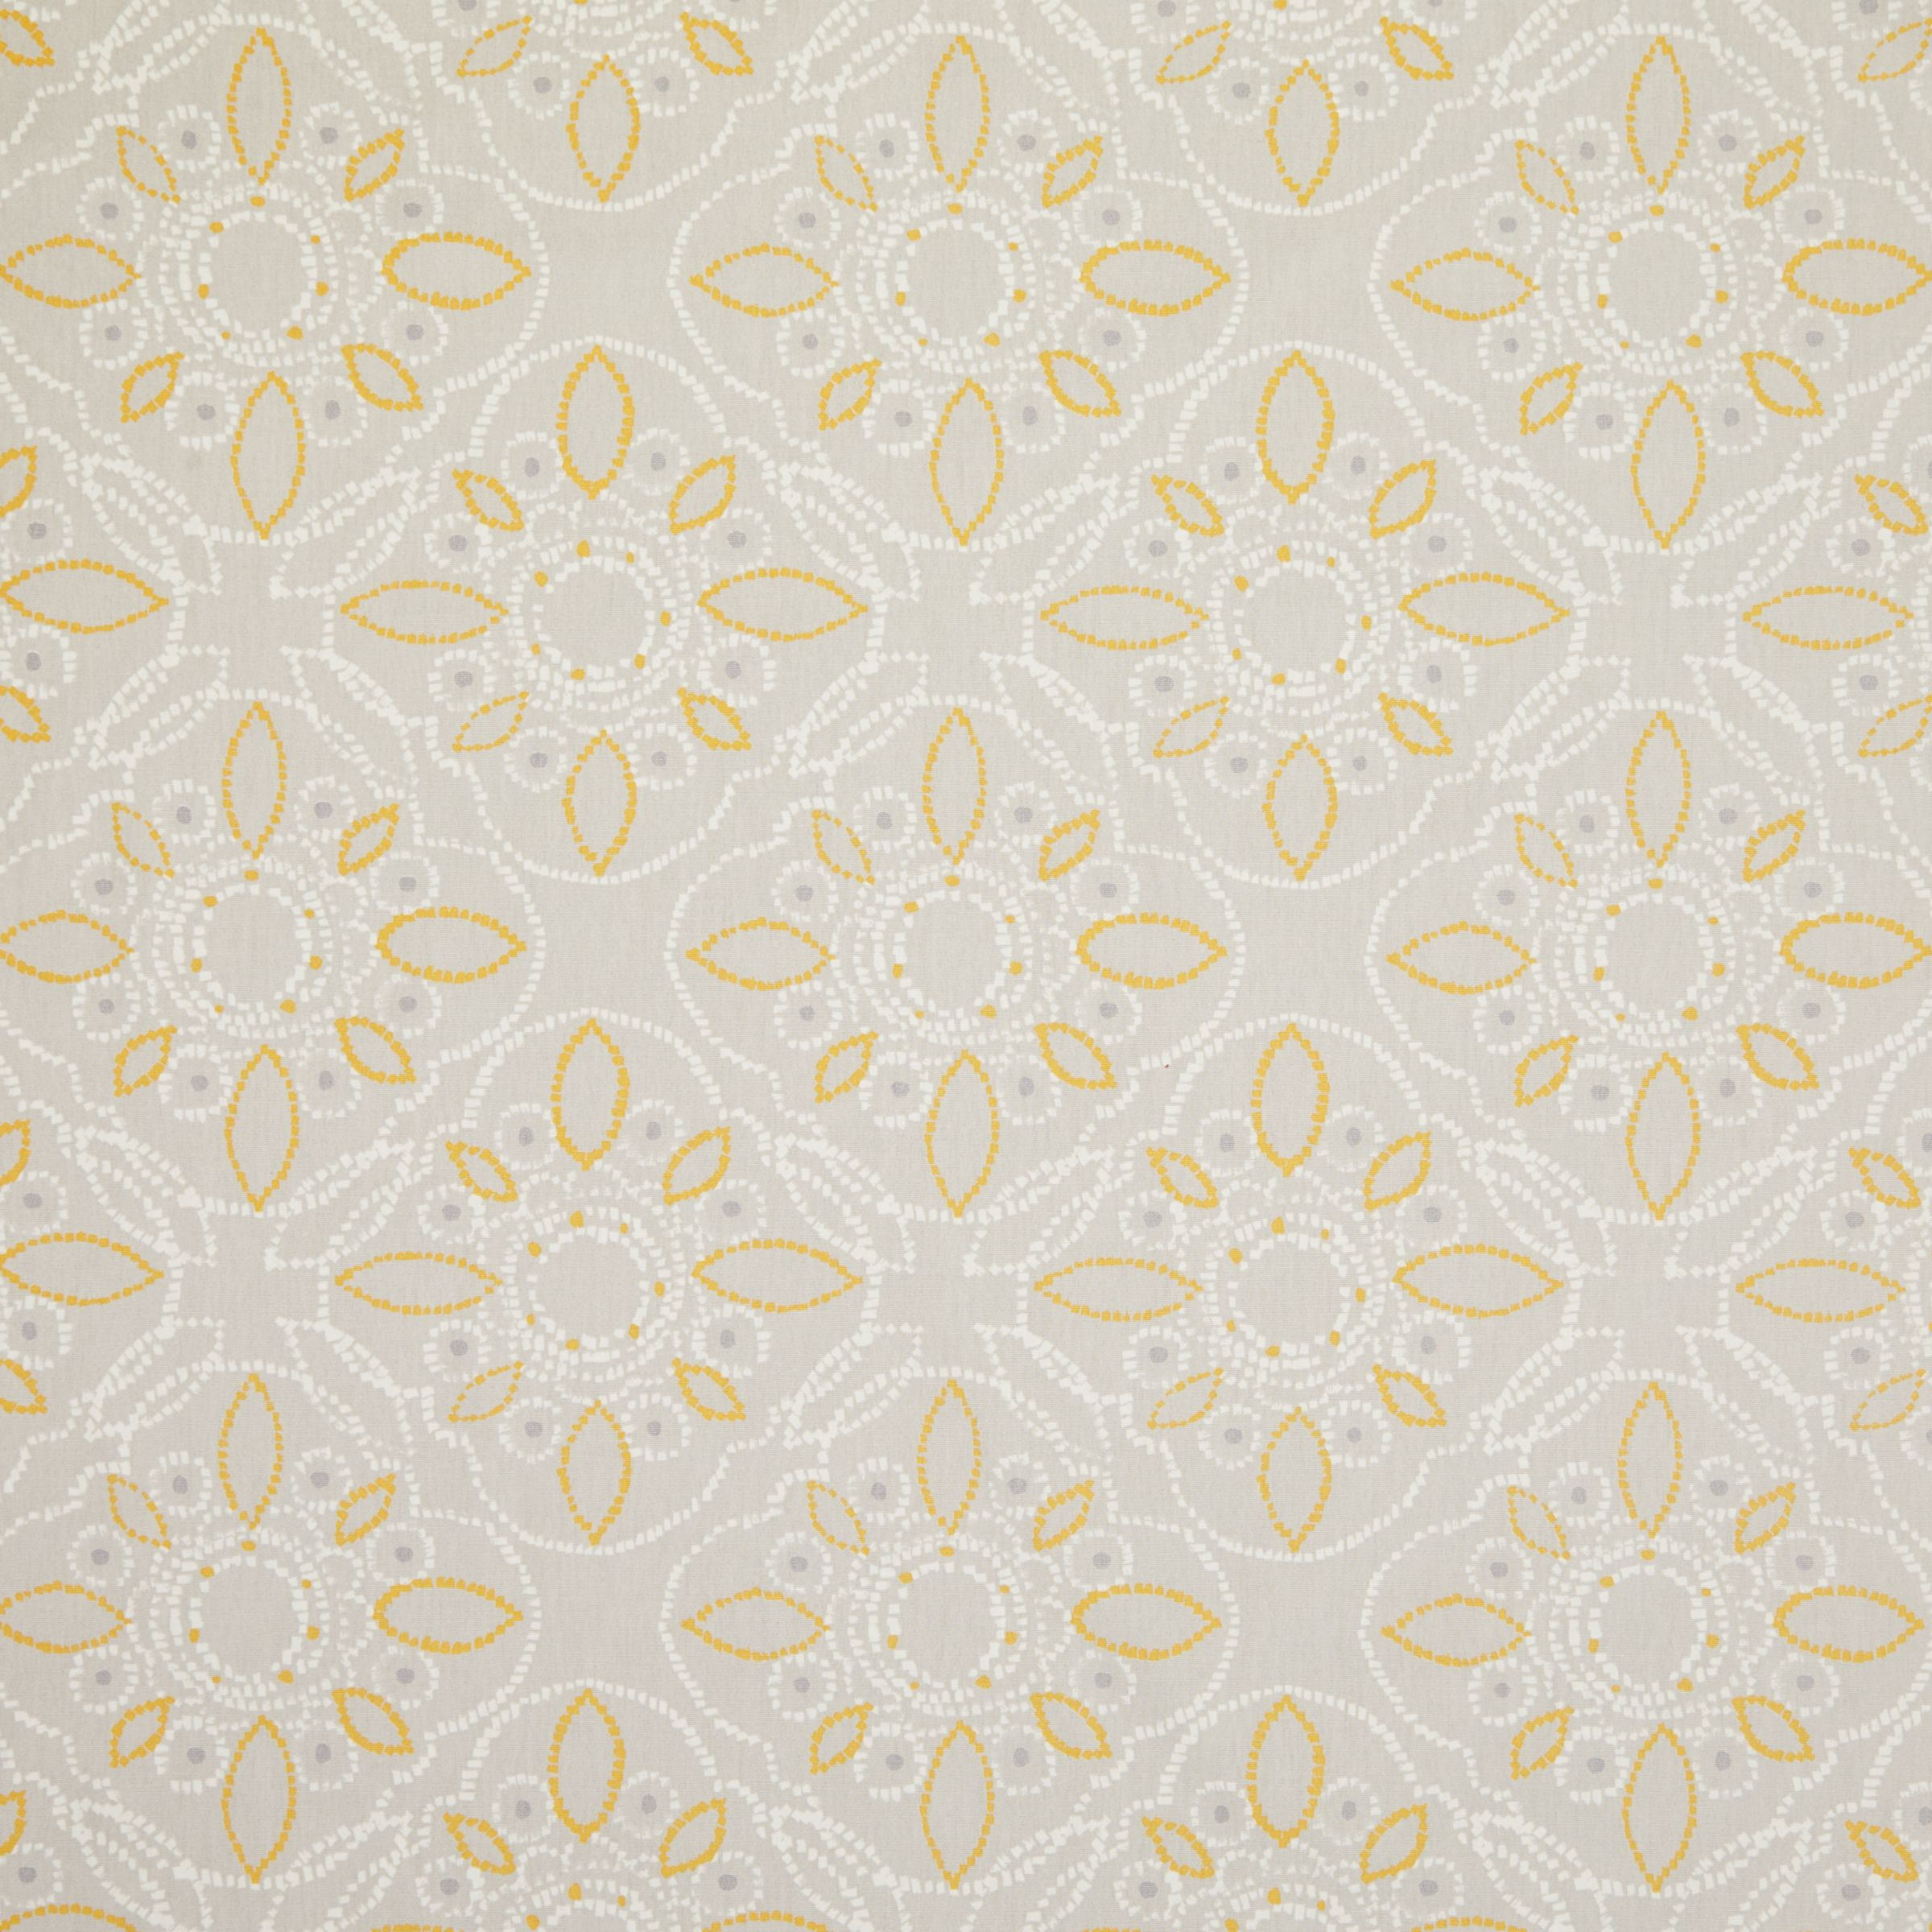 John Lewis & Partners Kasmanda PVC Tablecloth Fabric, Saffron